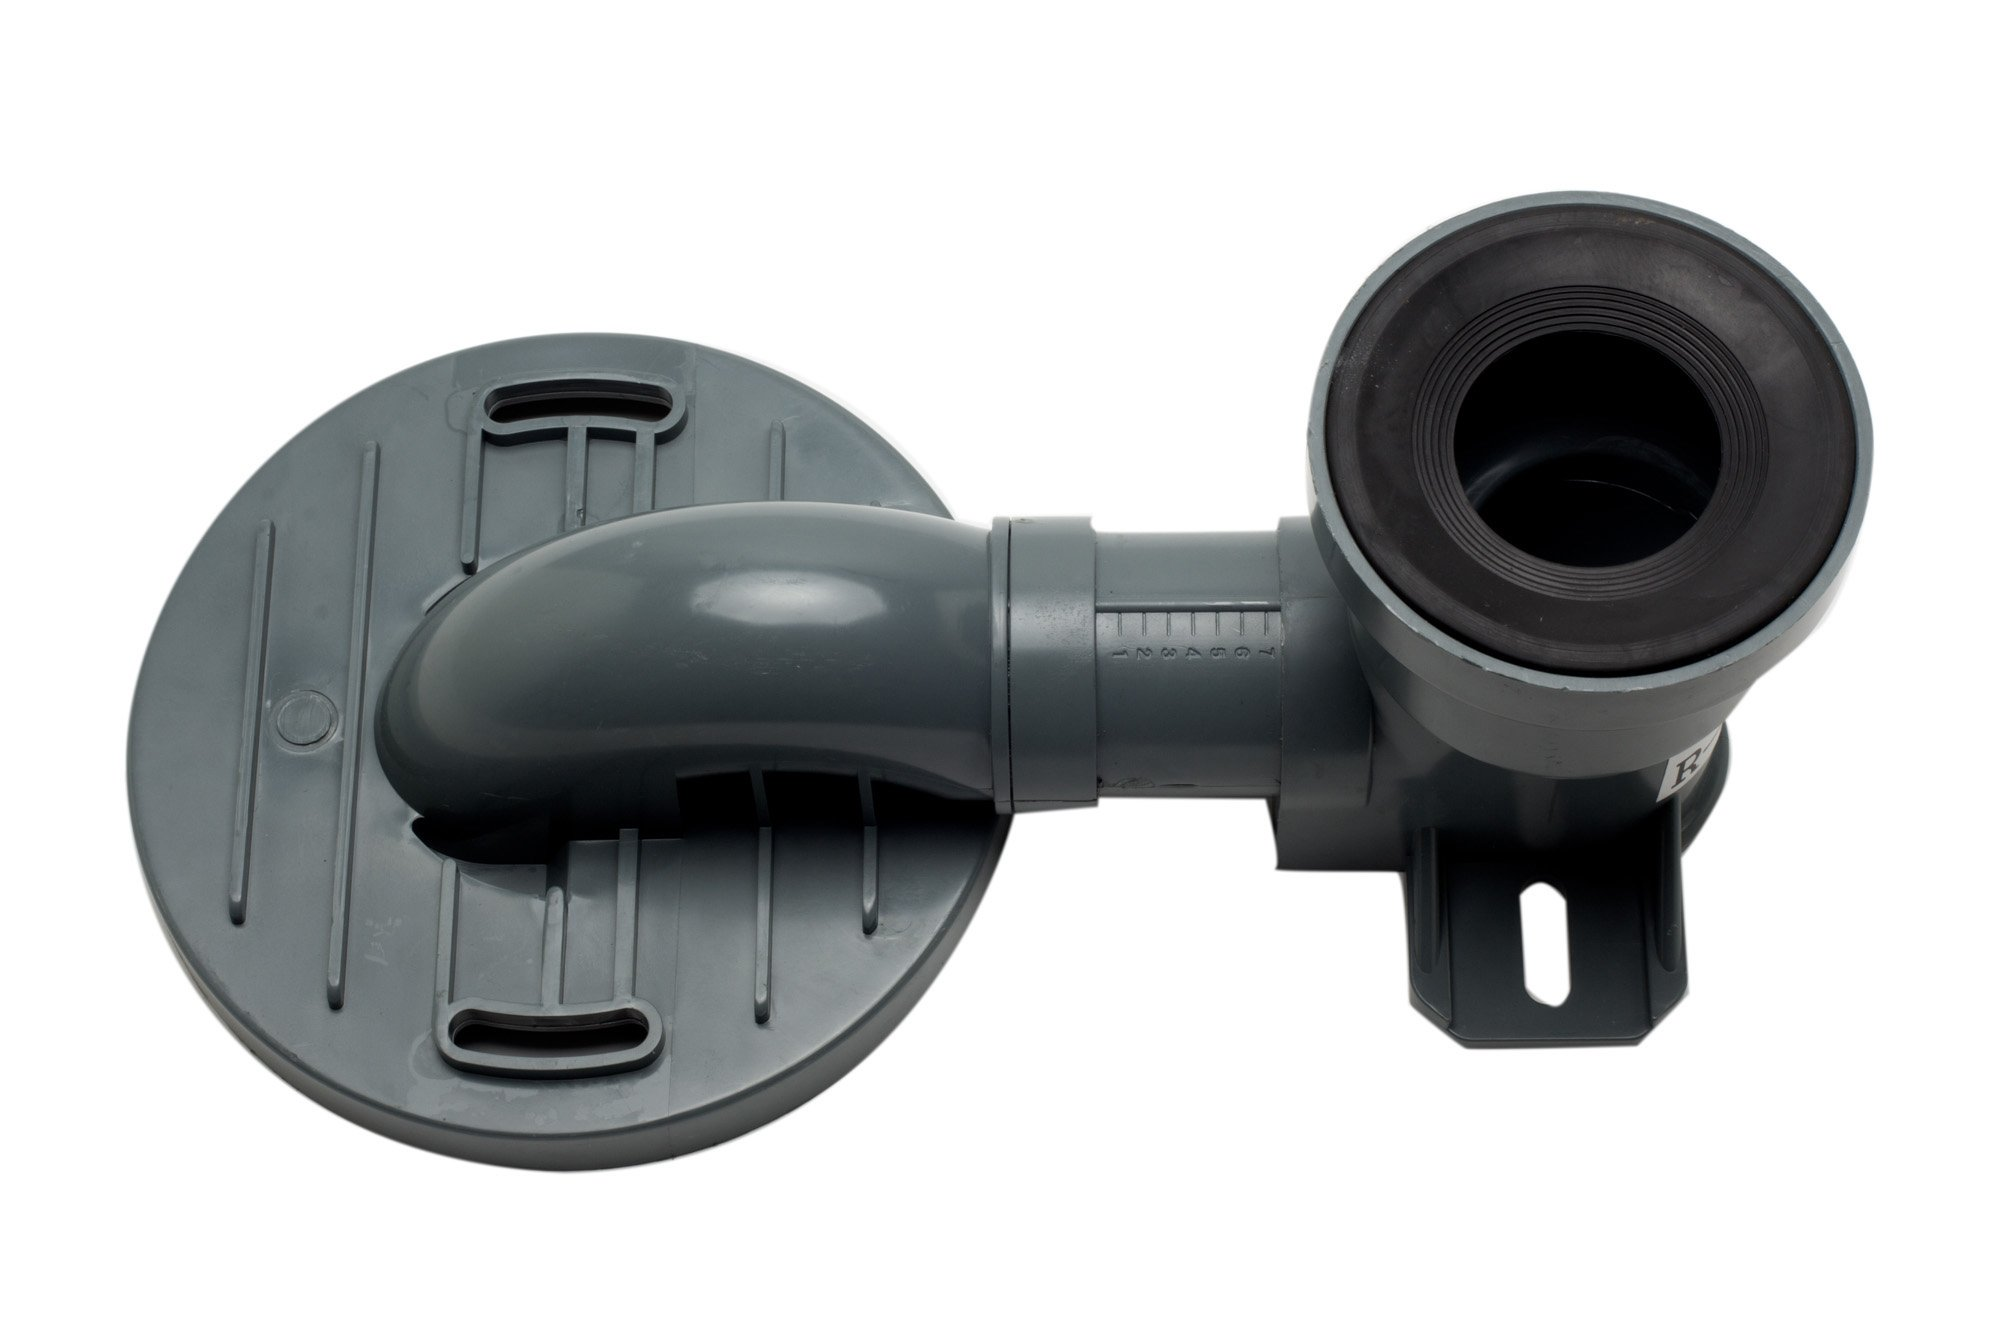 EAGO R-888TRAP TB222/TB309/TB340/TB133/TB346/TB359 Replacement Toilet Trap by EAGO